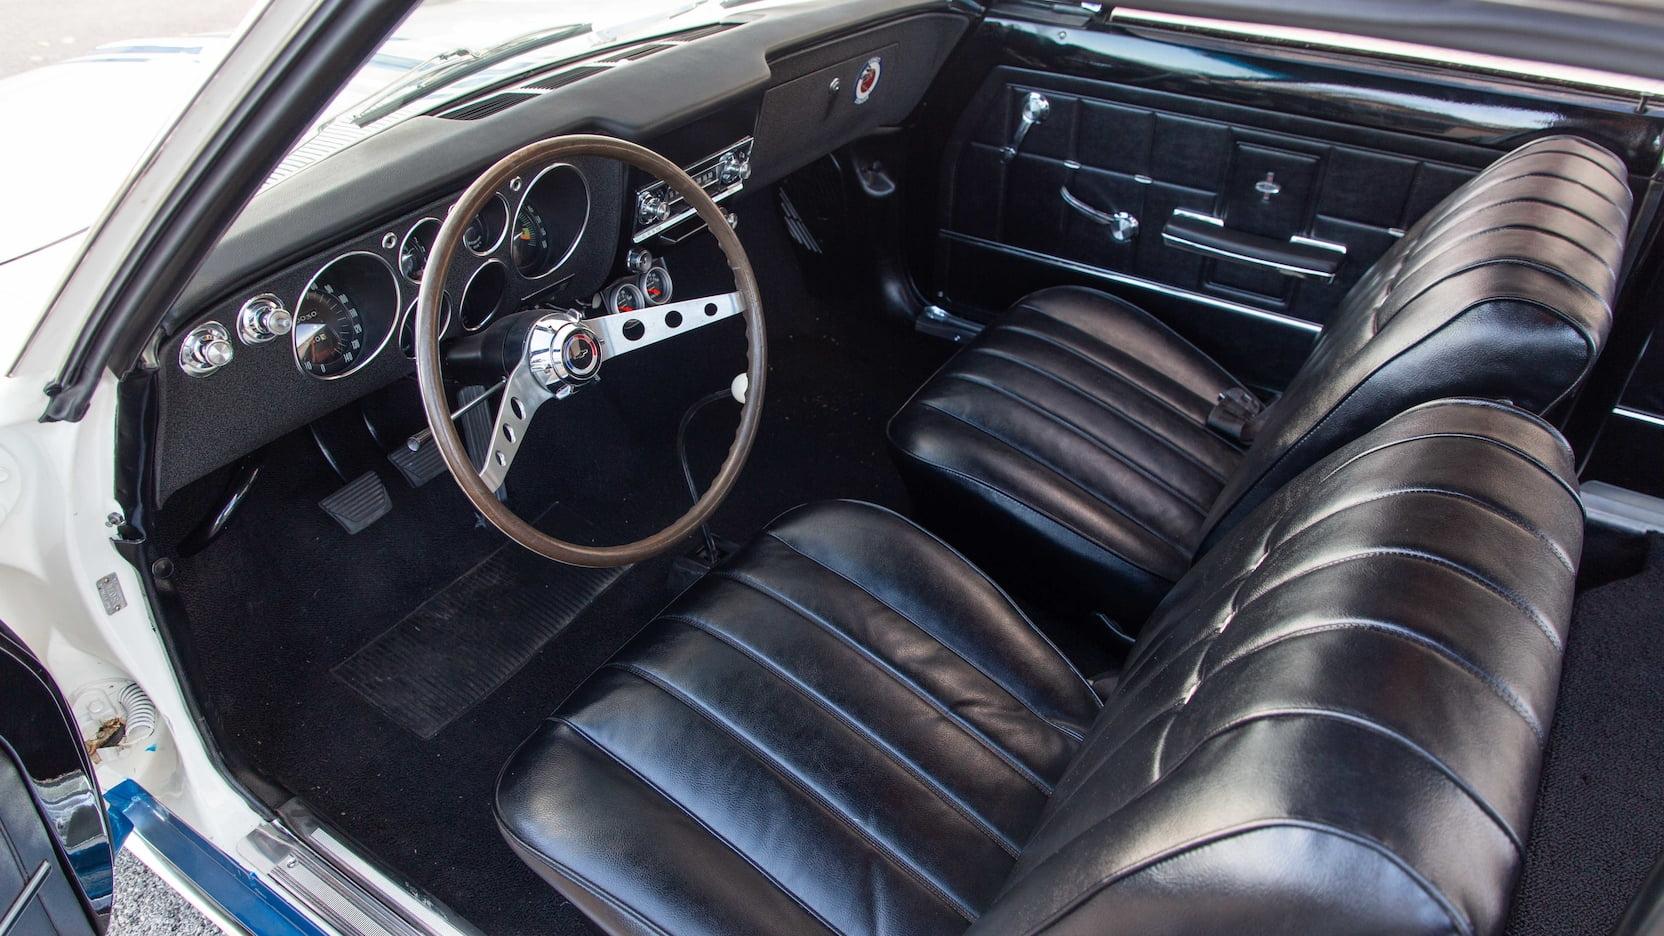 1966 Chevrolet Yenko Stinger interior